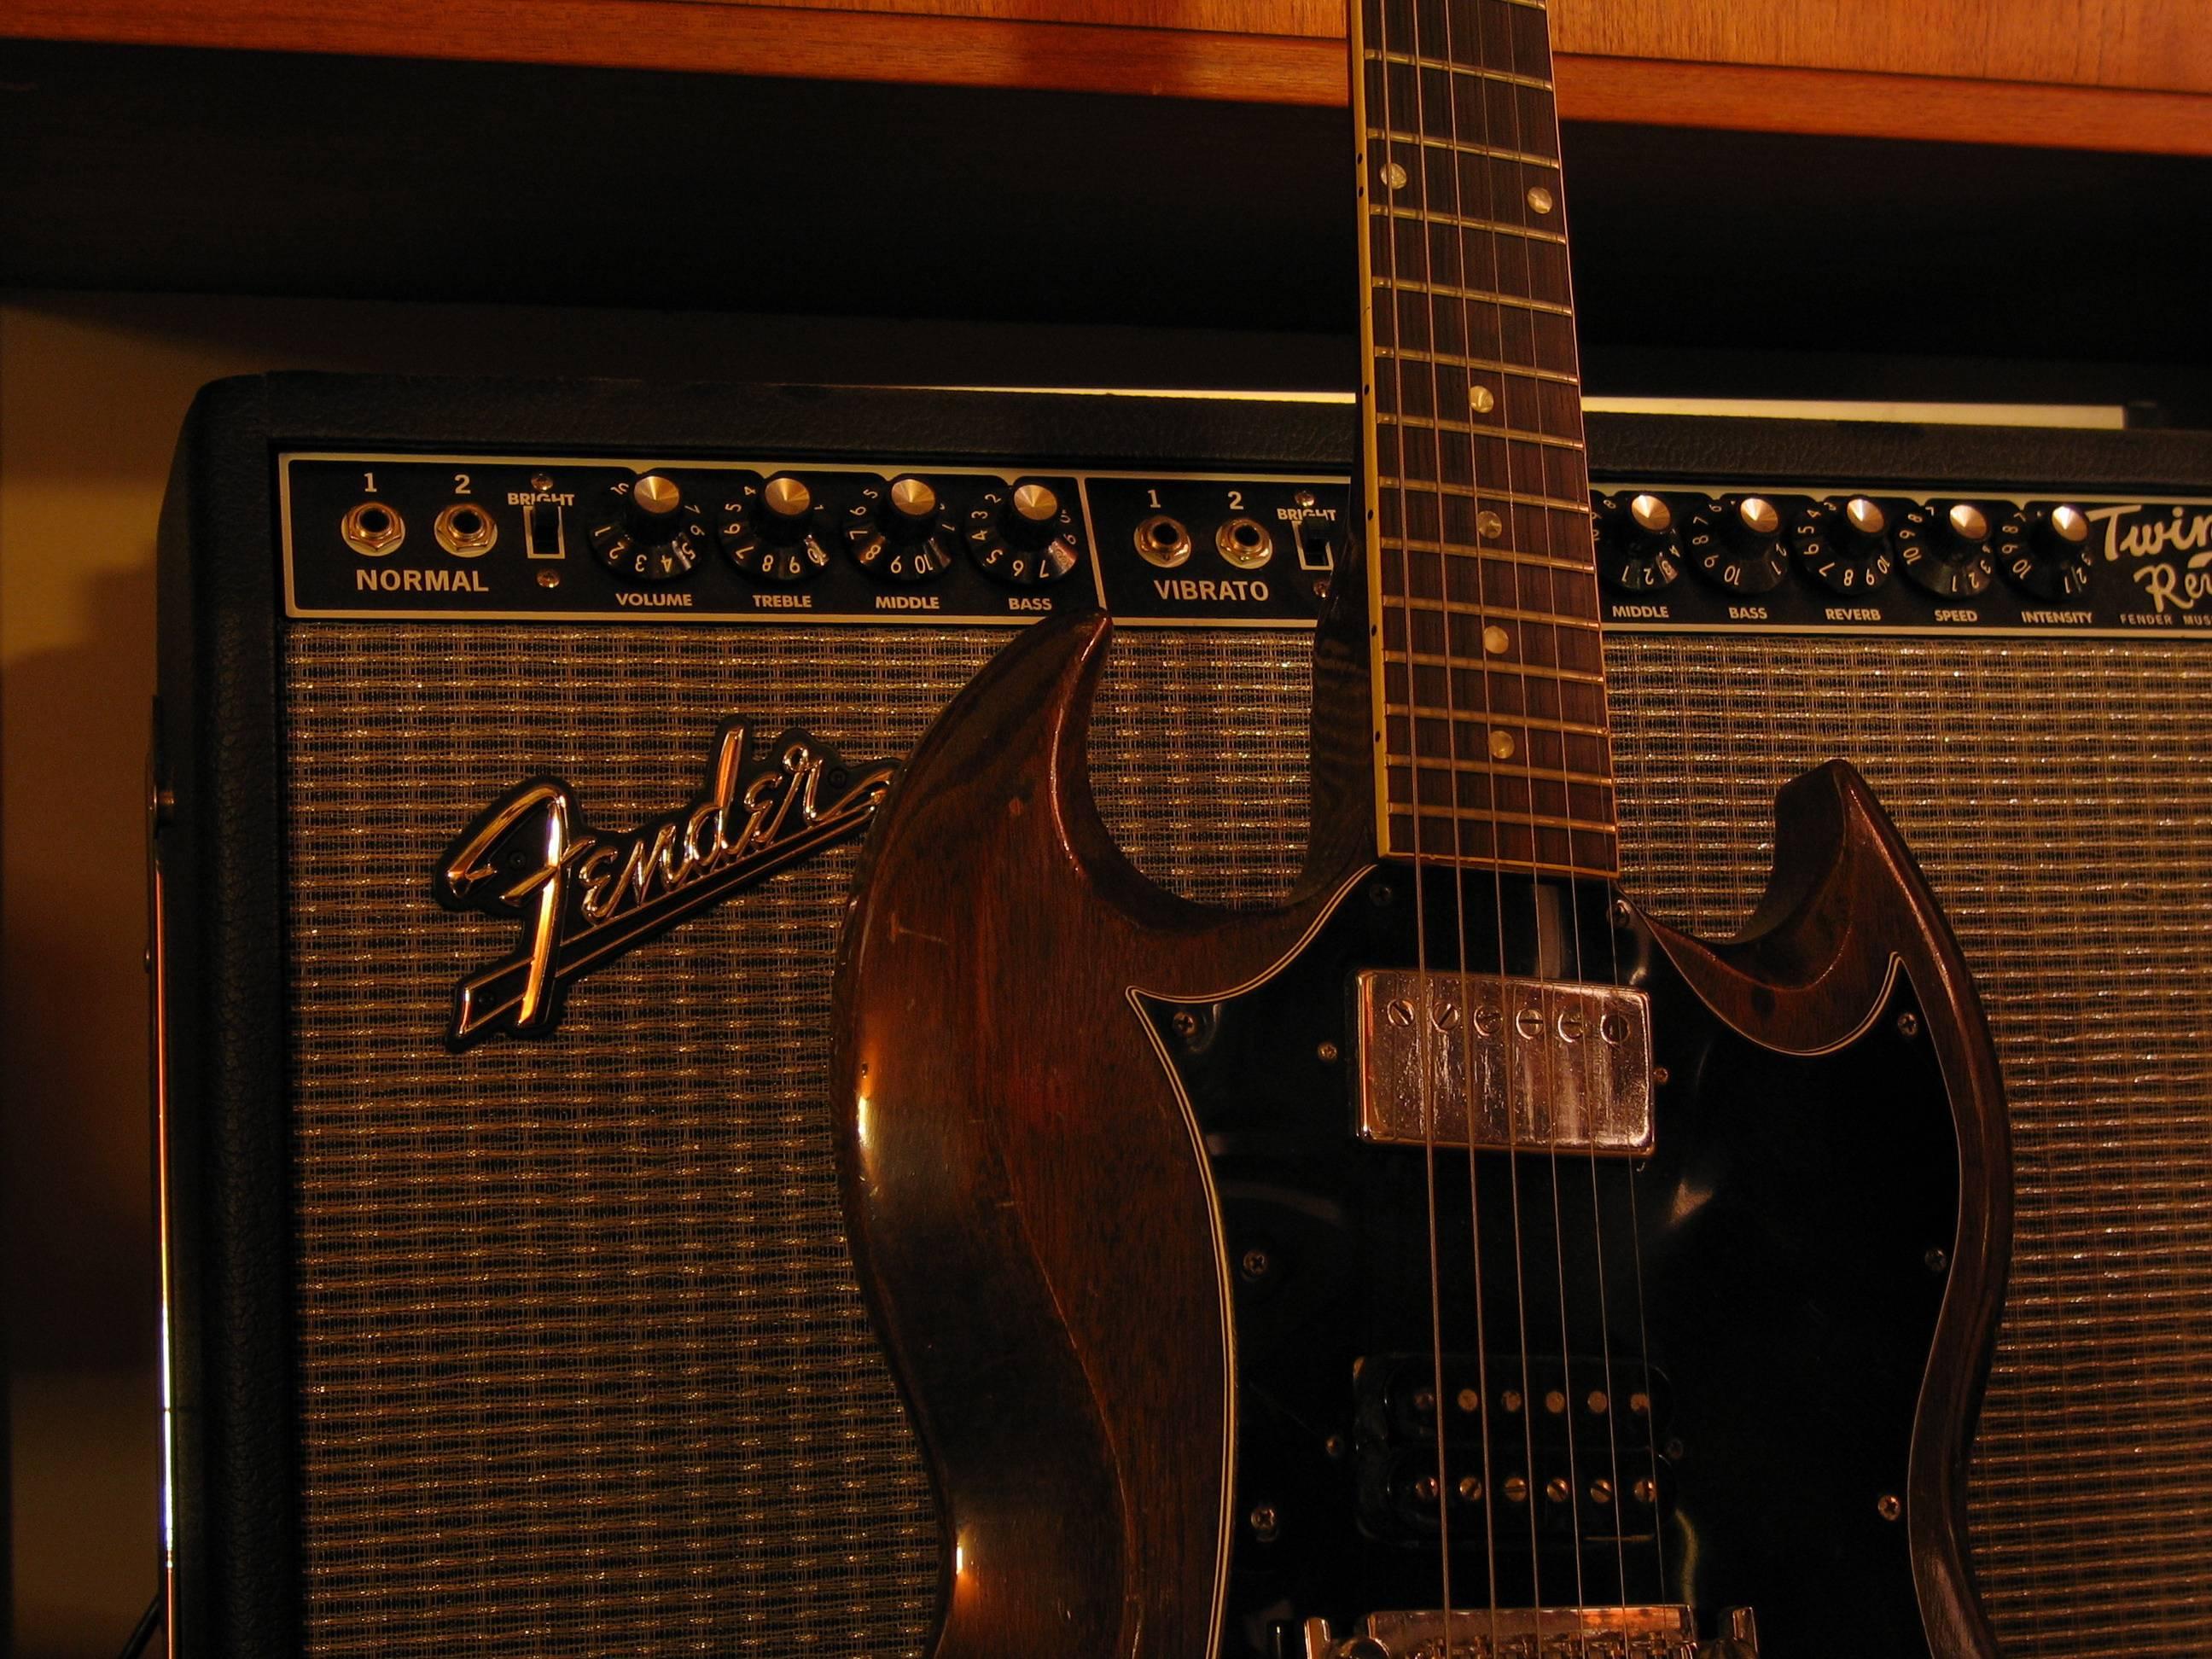 Guitar HD Wallpapers Backgrounds Wallpaper 1920?1200 Wallpapers Of ...